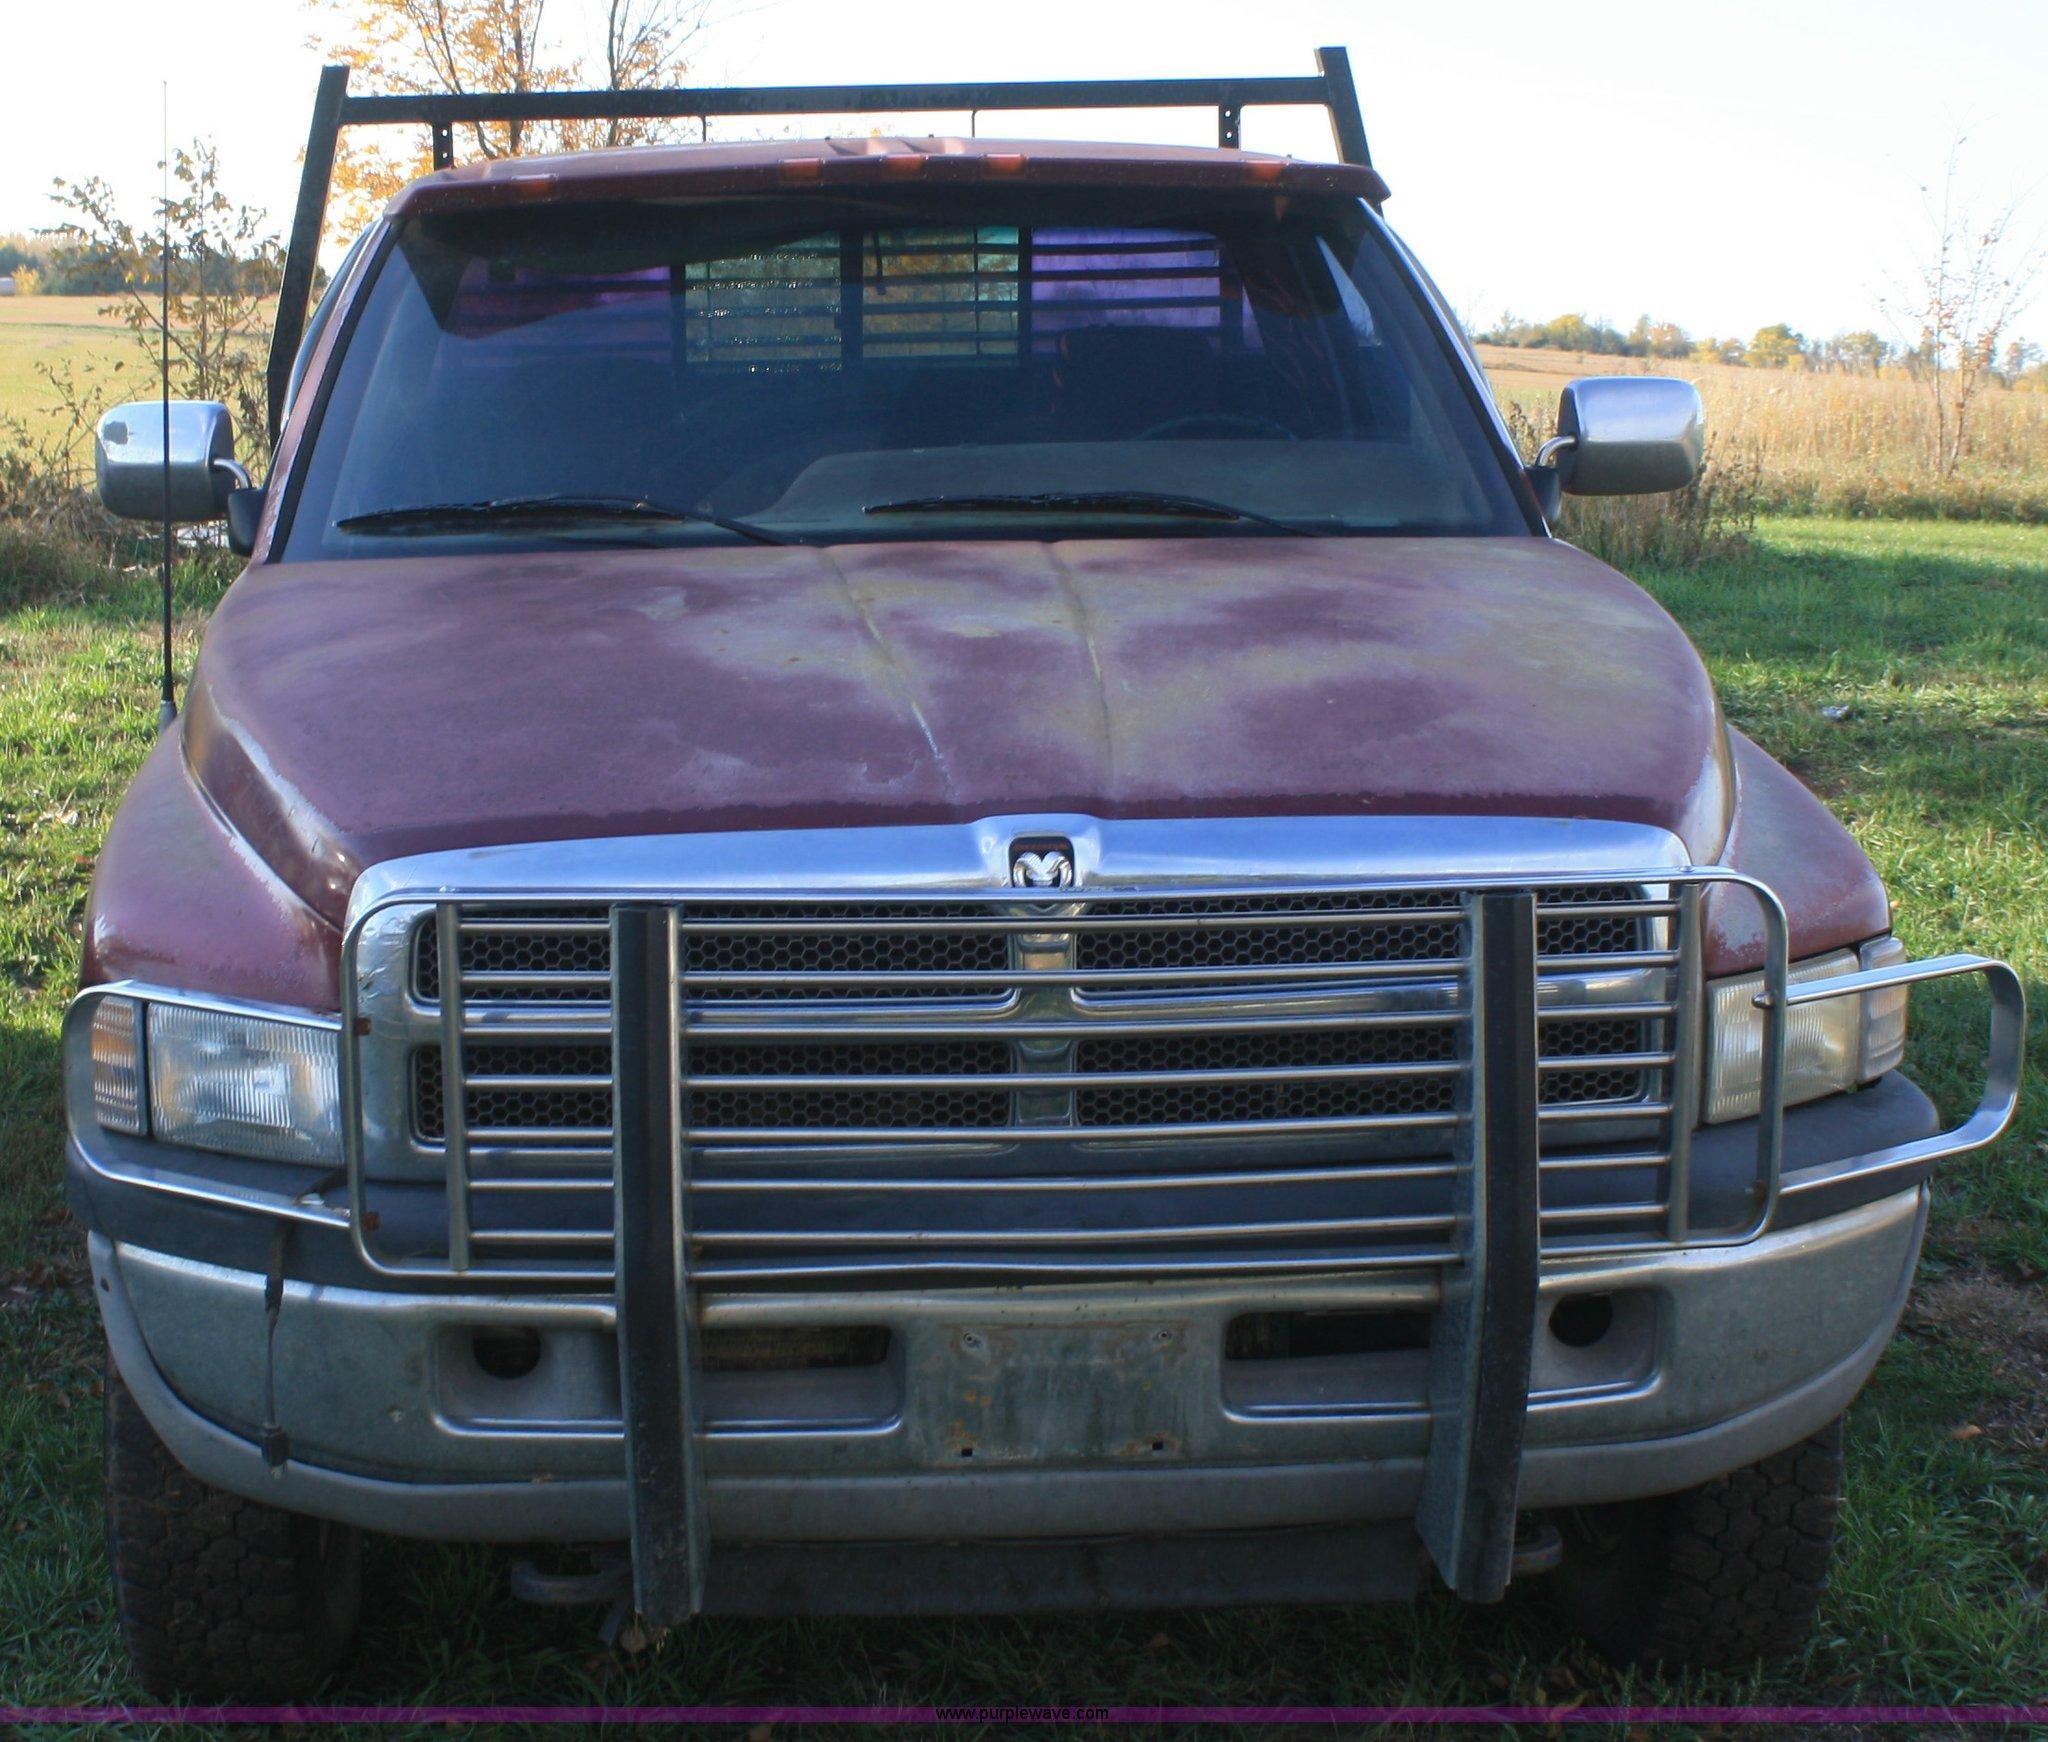 1994 Dodge Ram 2500 Flatbed Pickup Truck Item F2697 Sold Full Size In New Window